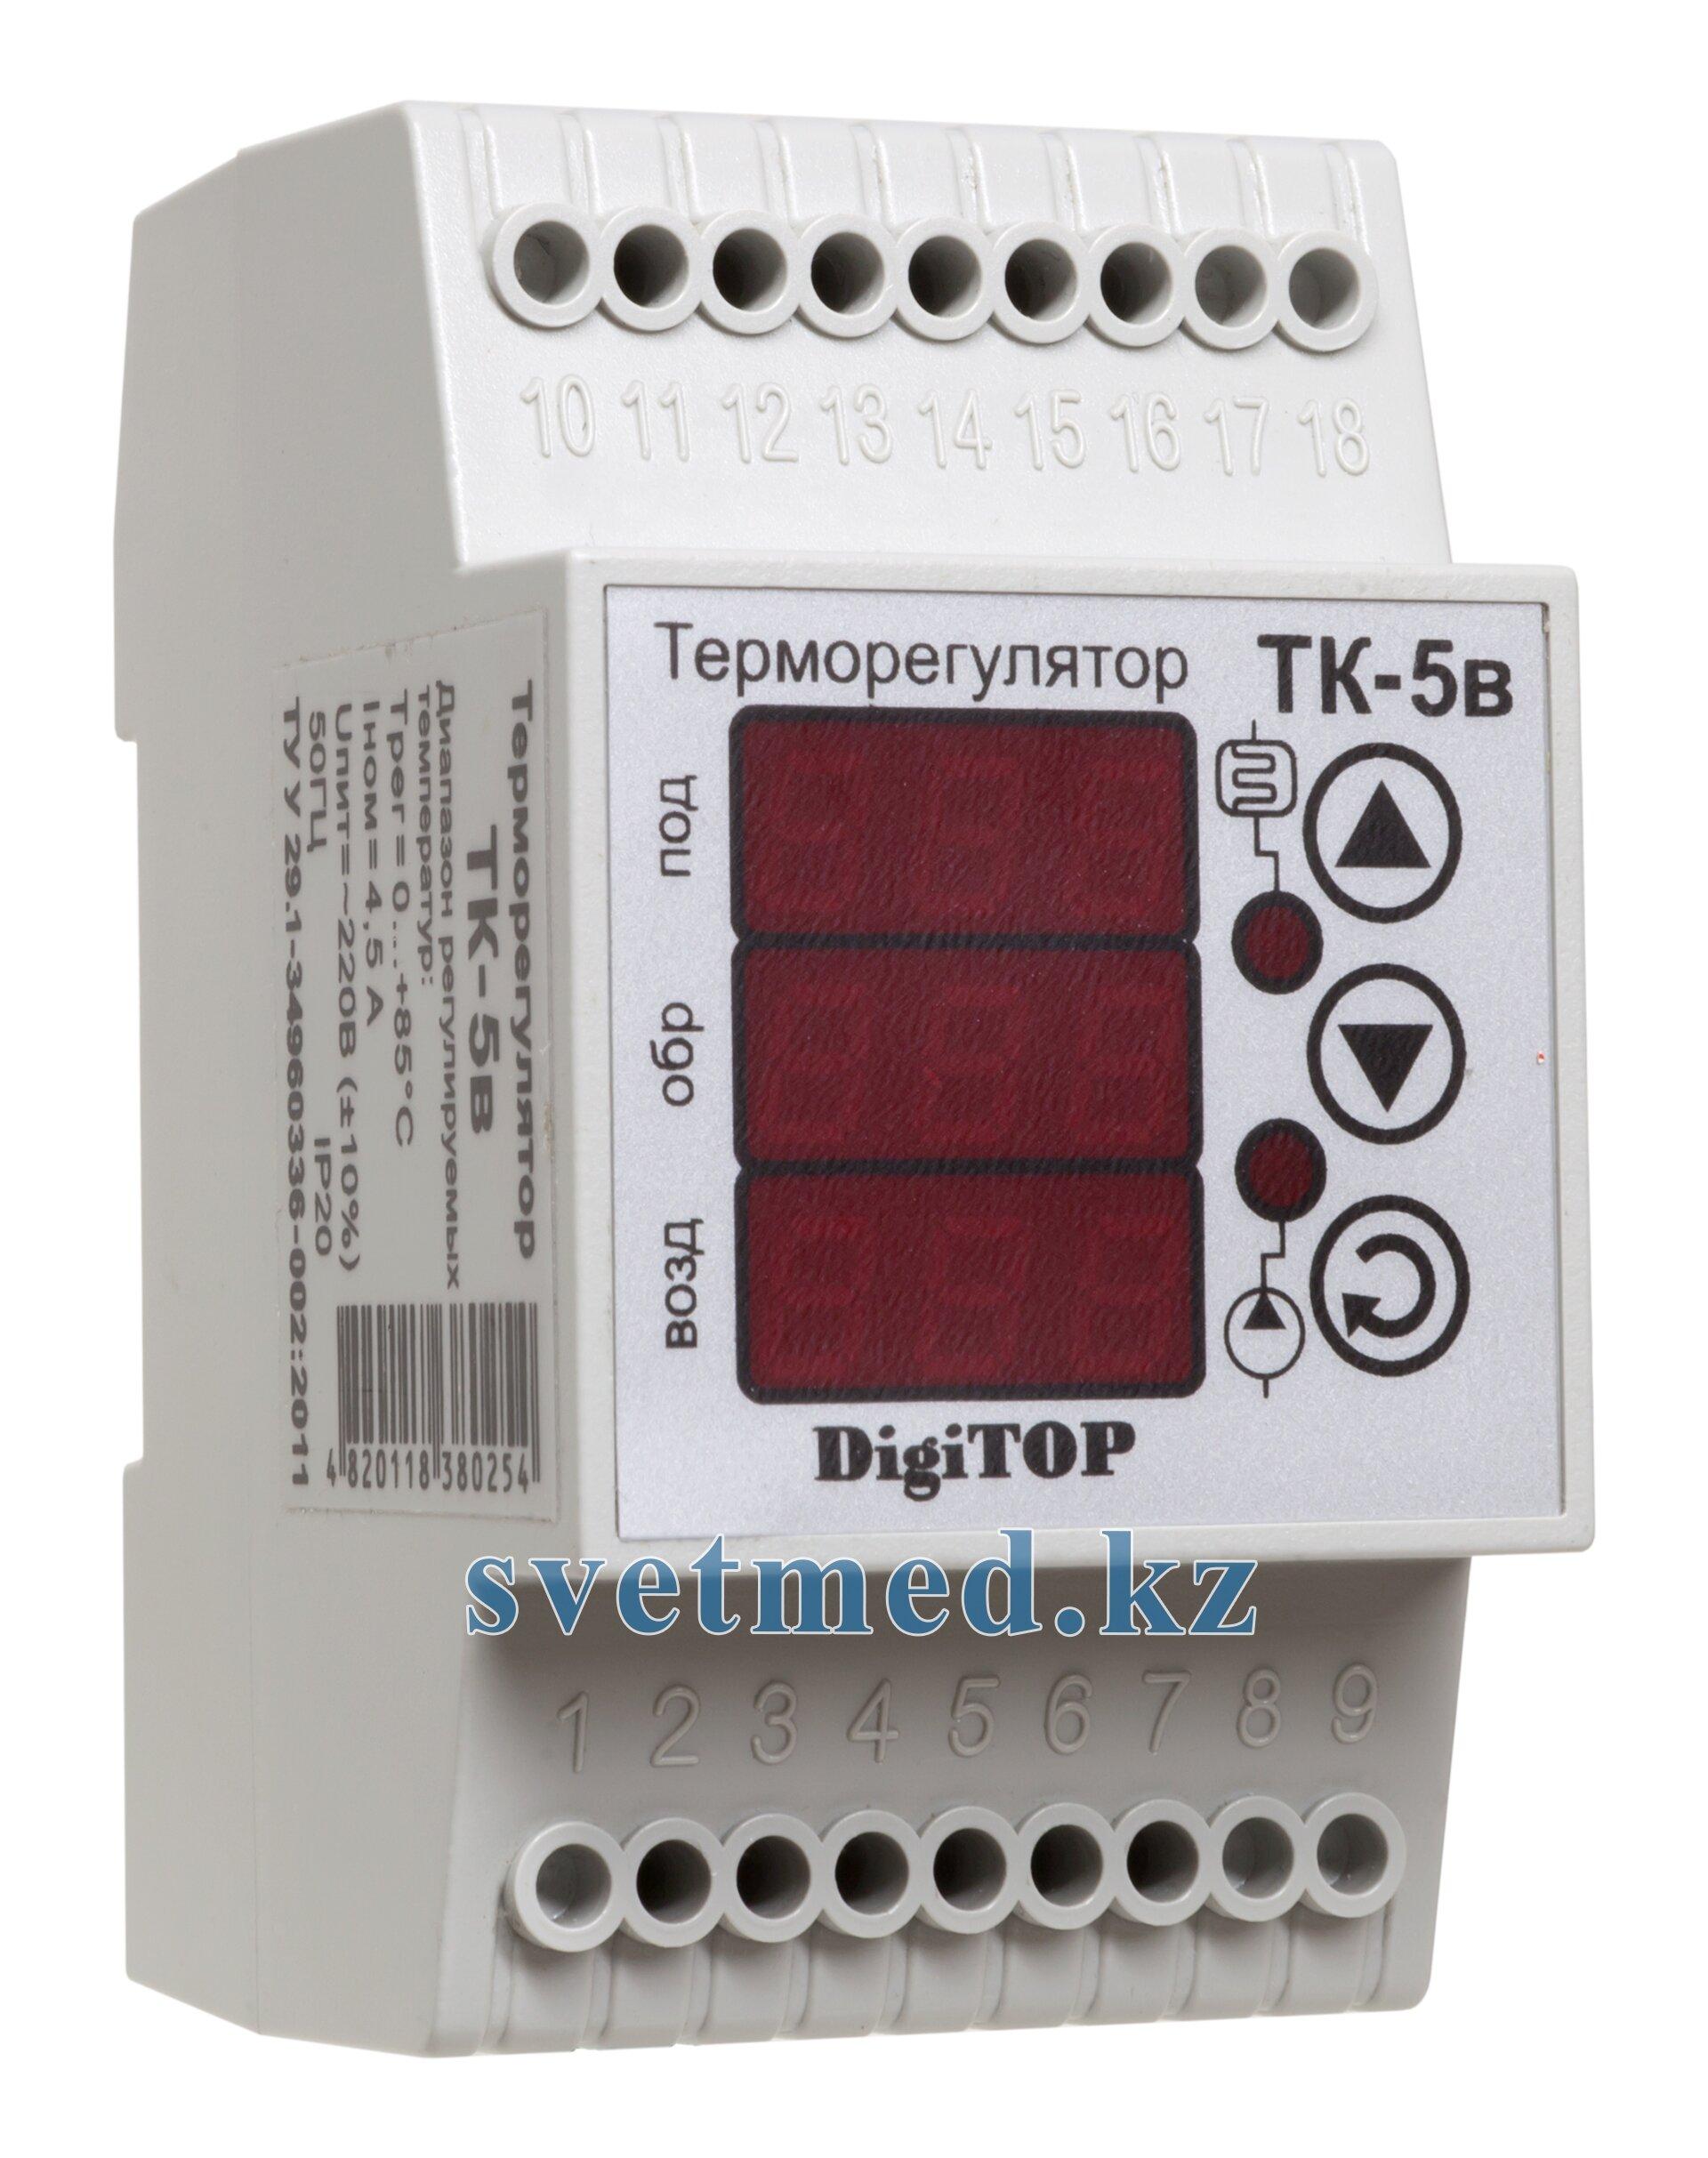 Терморегулятор ТК-5в (0… +85°C, 2х6А) - фото pic_f3135842cf5aaa5_700x3000_1.jpg